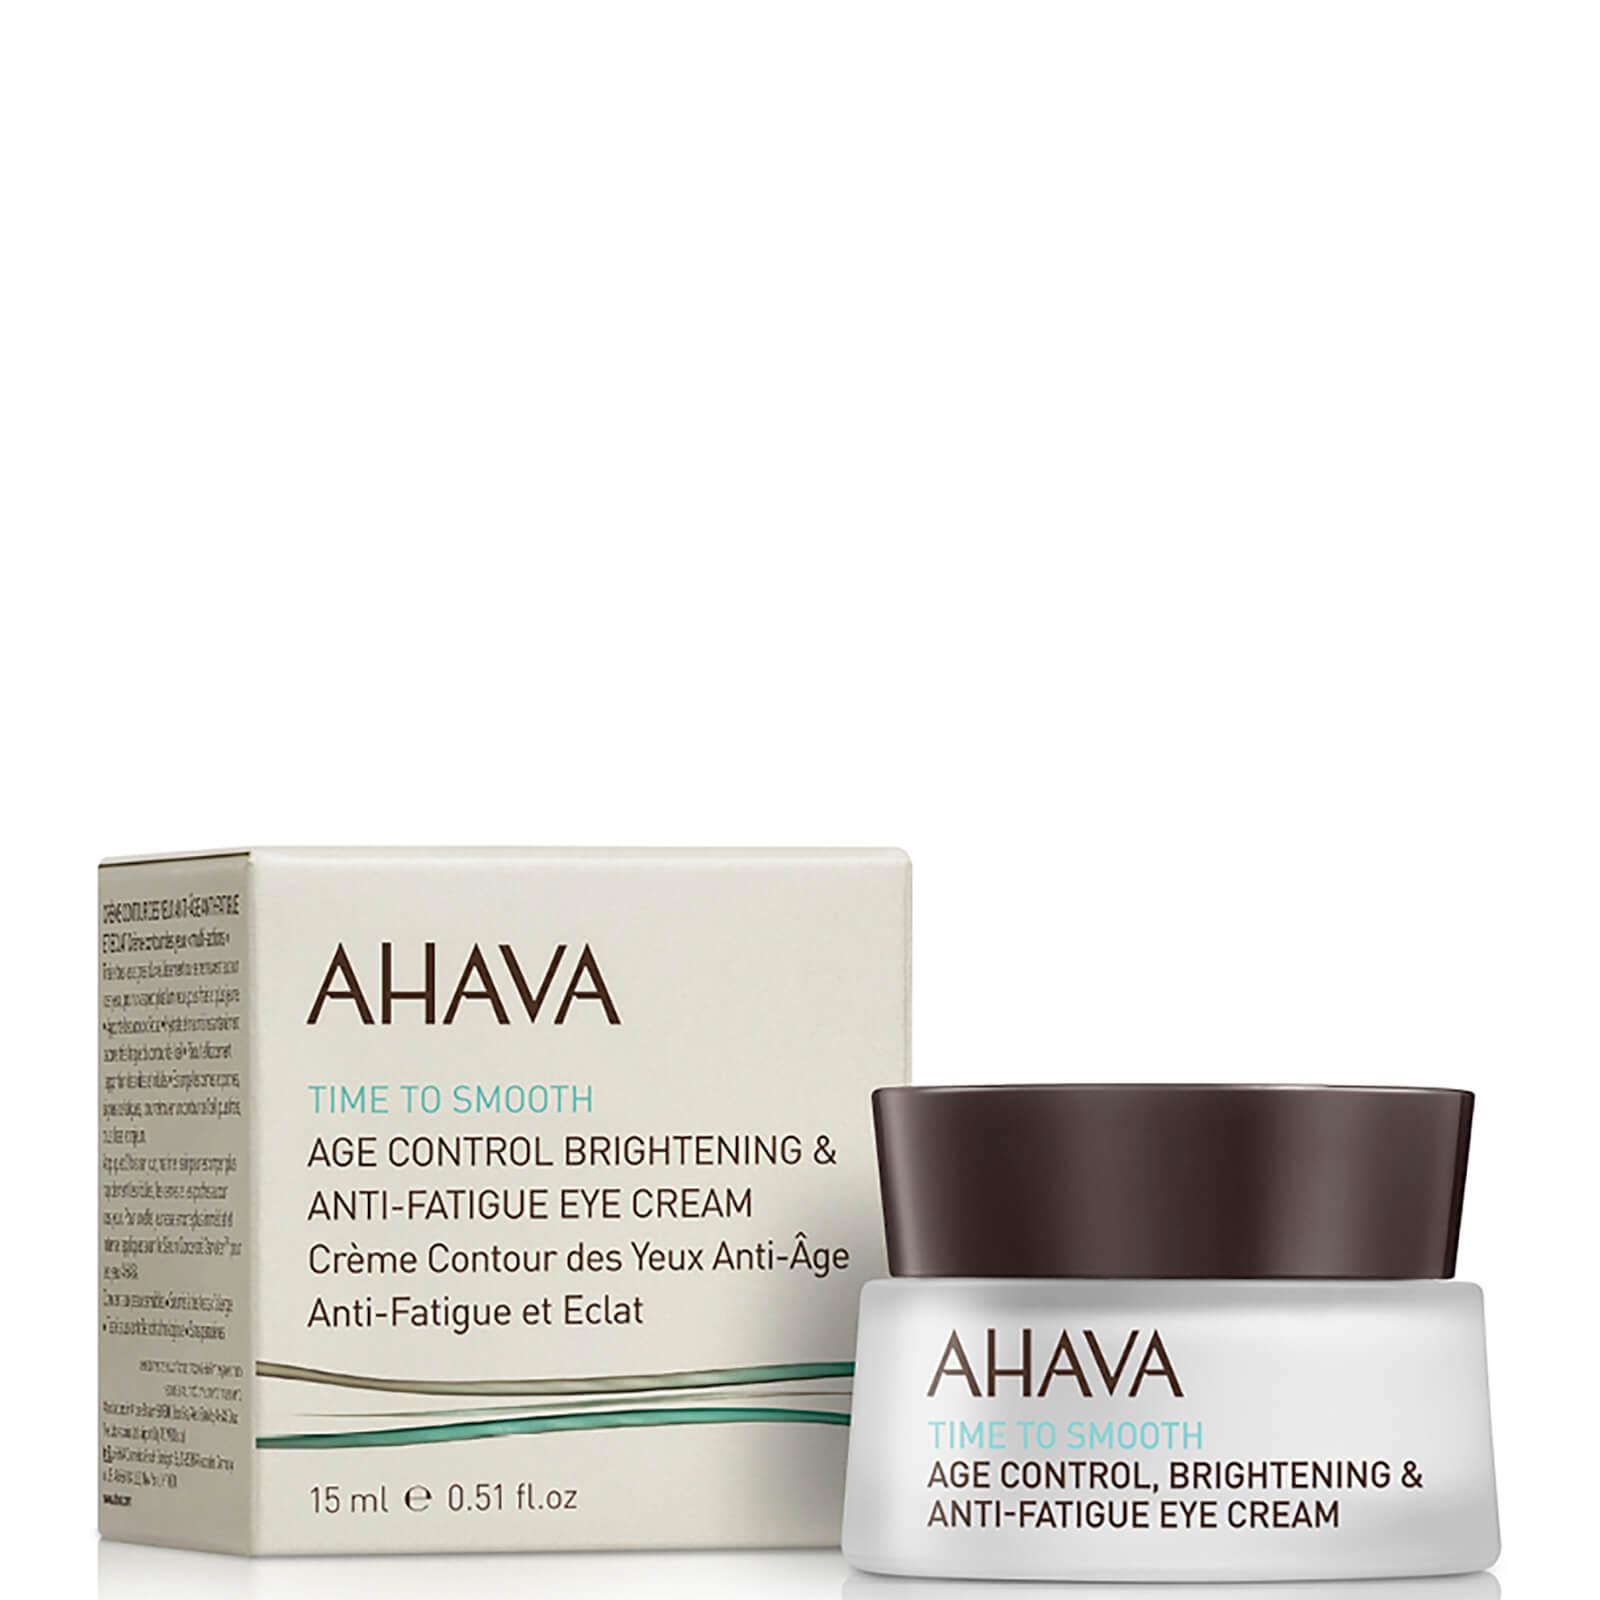 AHAVA Age Control Brightening Eye Cream 15ml